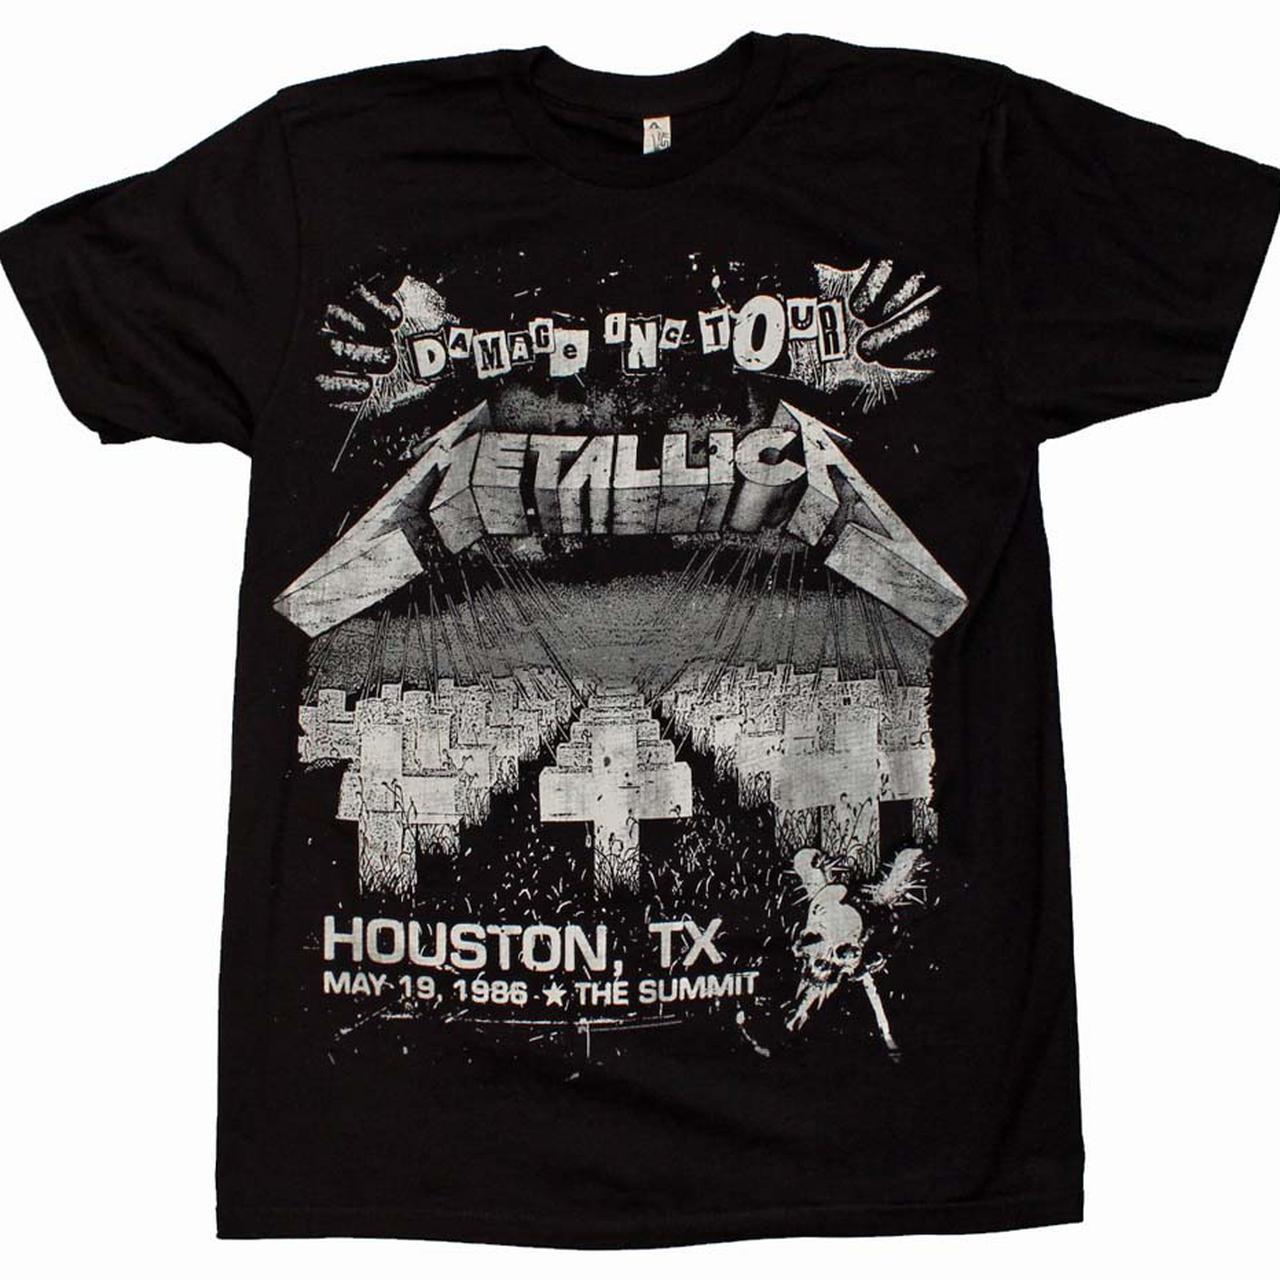 2314cdc3e0a82 T Shirts Metallica - DREAMWORKS